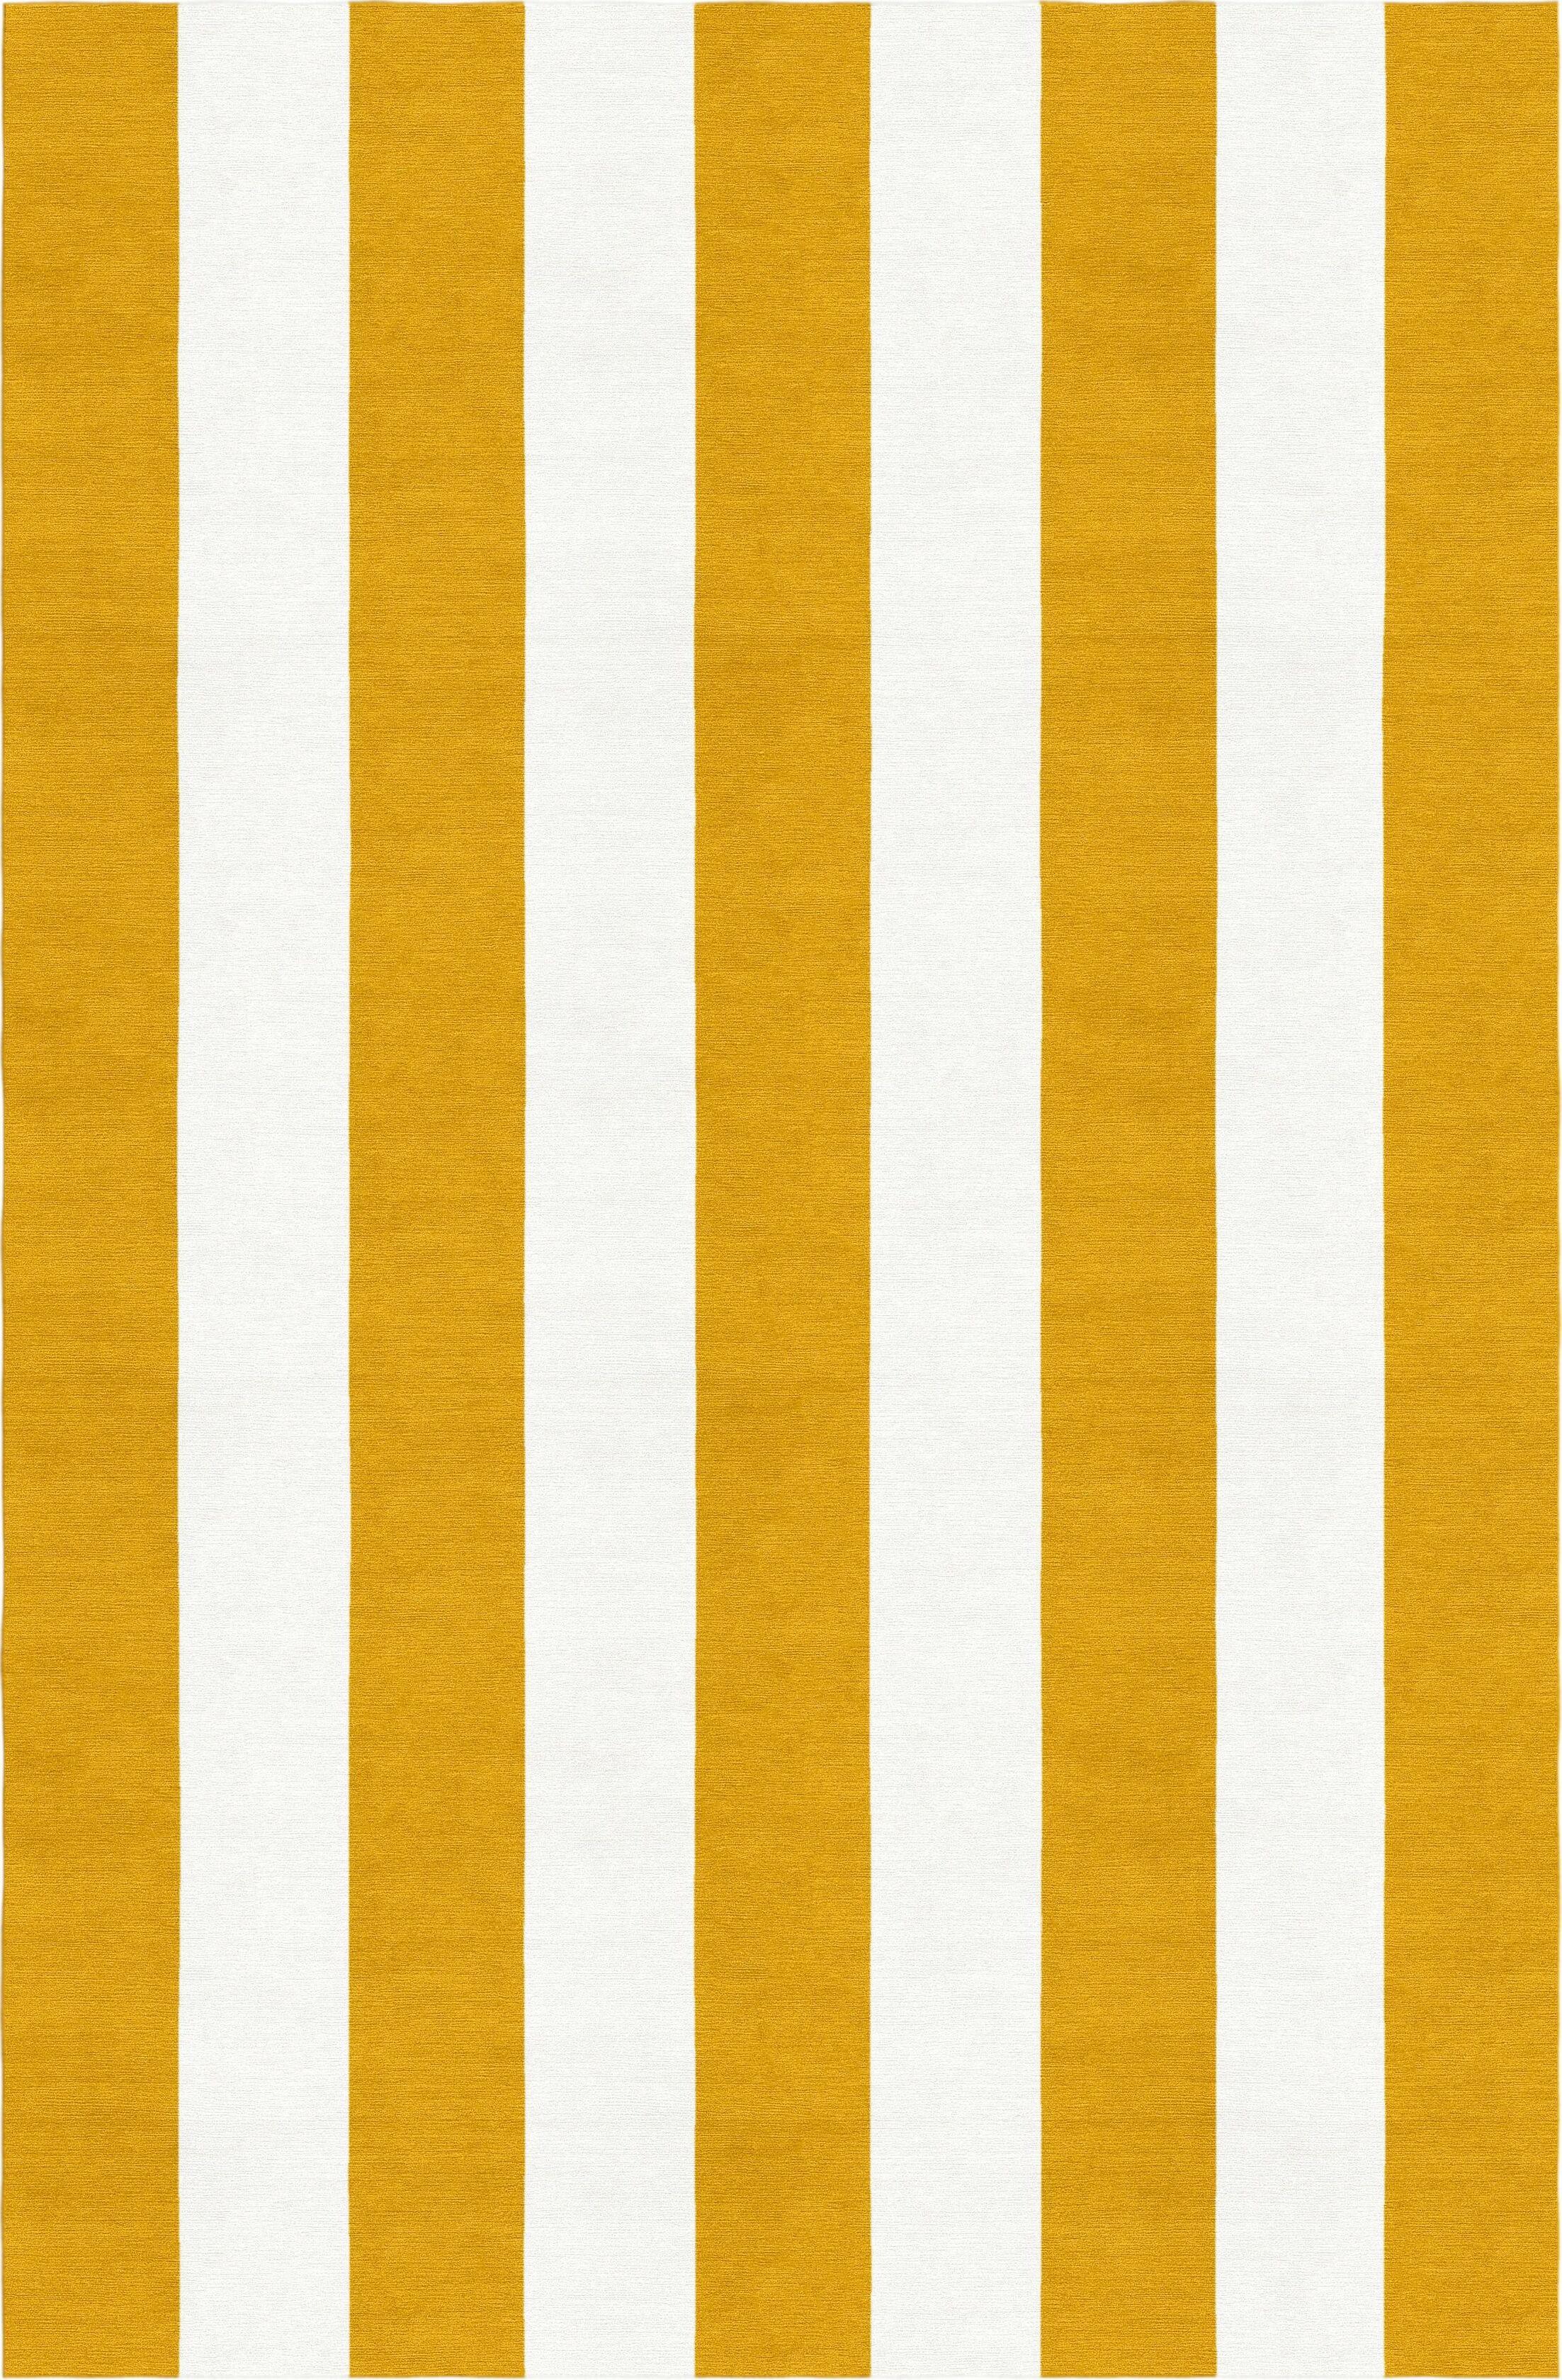 Watlington Stripe Hand-Woven Wool Dark Gold/White Area Rug Rug Size: Rectangle 6' x 9'